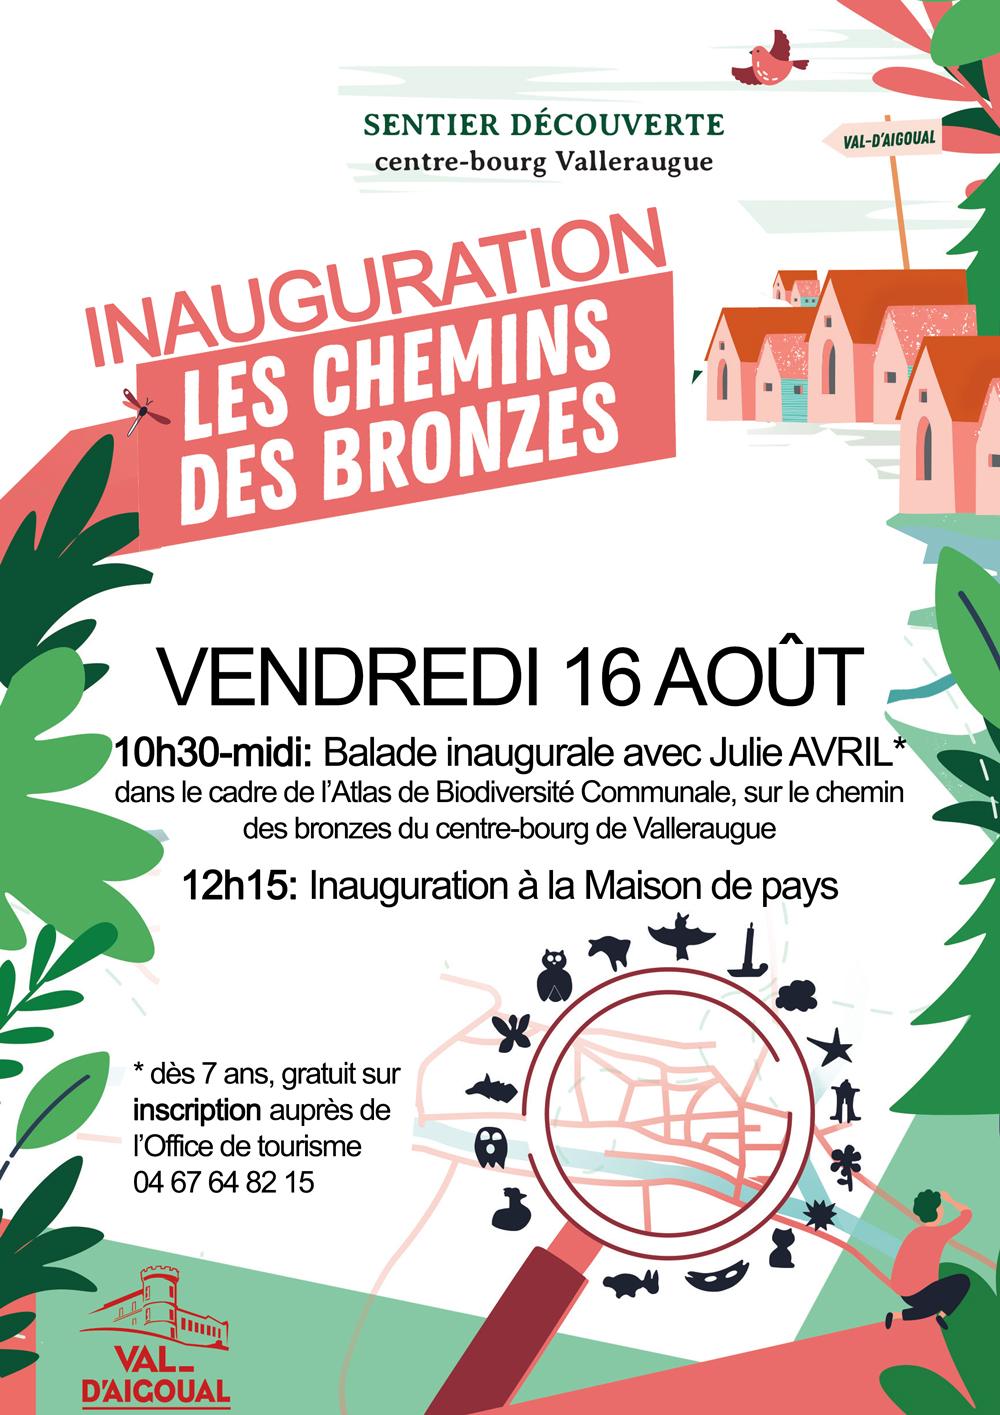 Inauguration 'Les chemins des bronzes' vendredi 16 août 2019 à 10h30